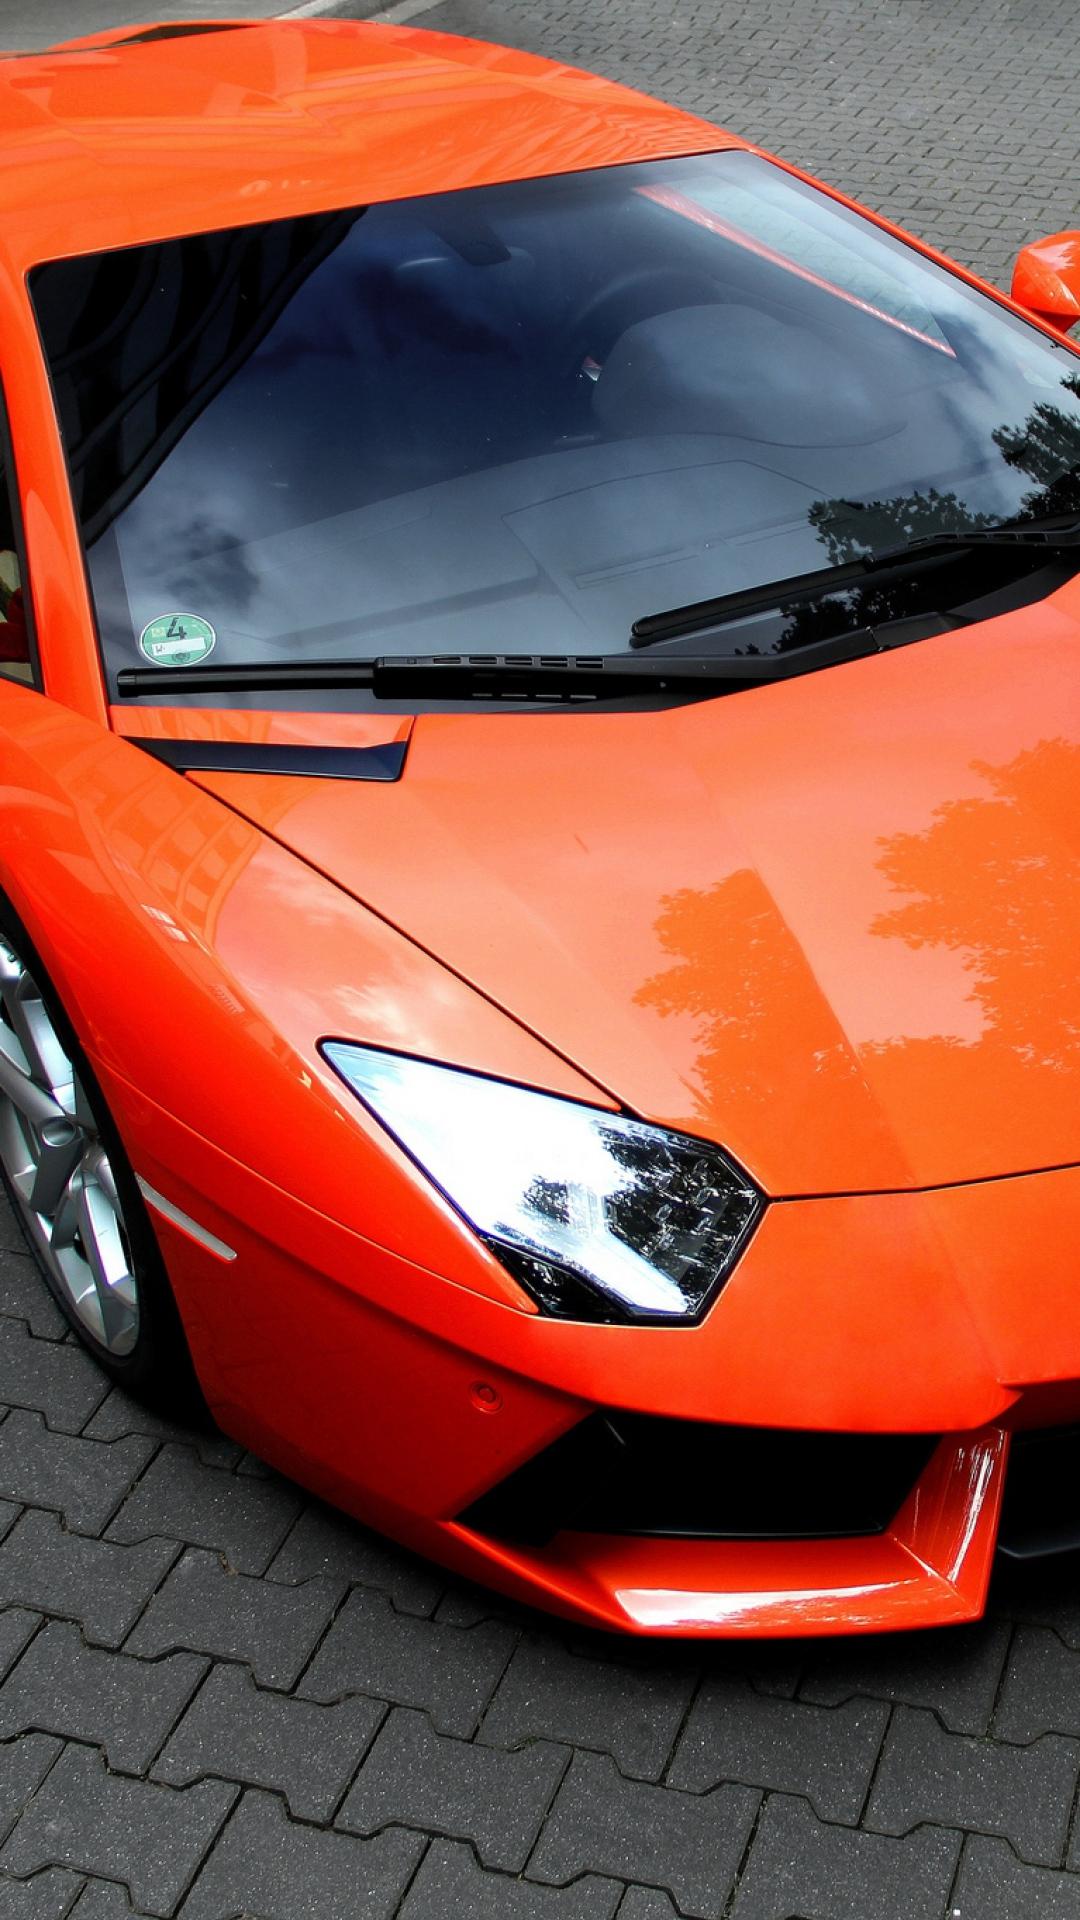 Orange Lamborghini Aventador - Best htc one wallpapers ...